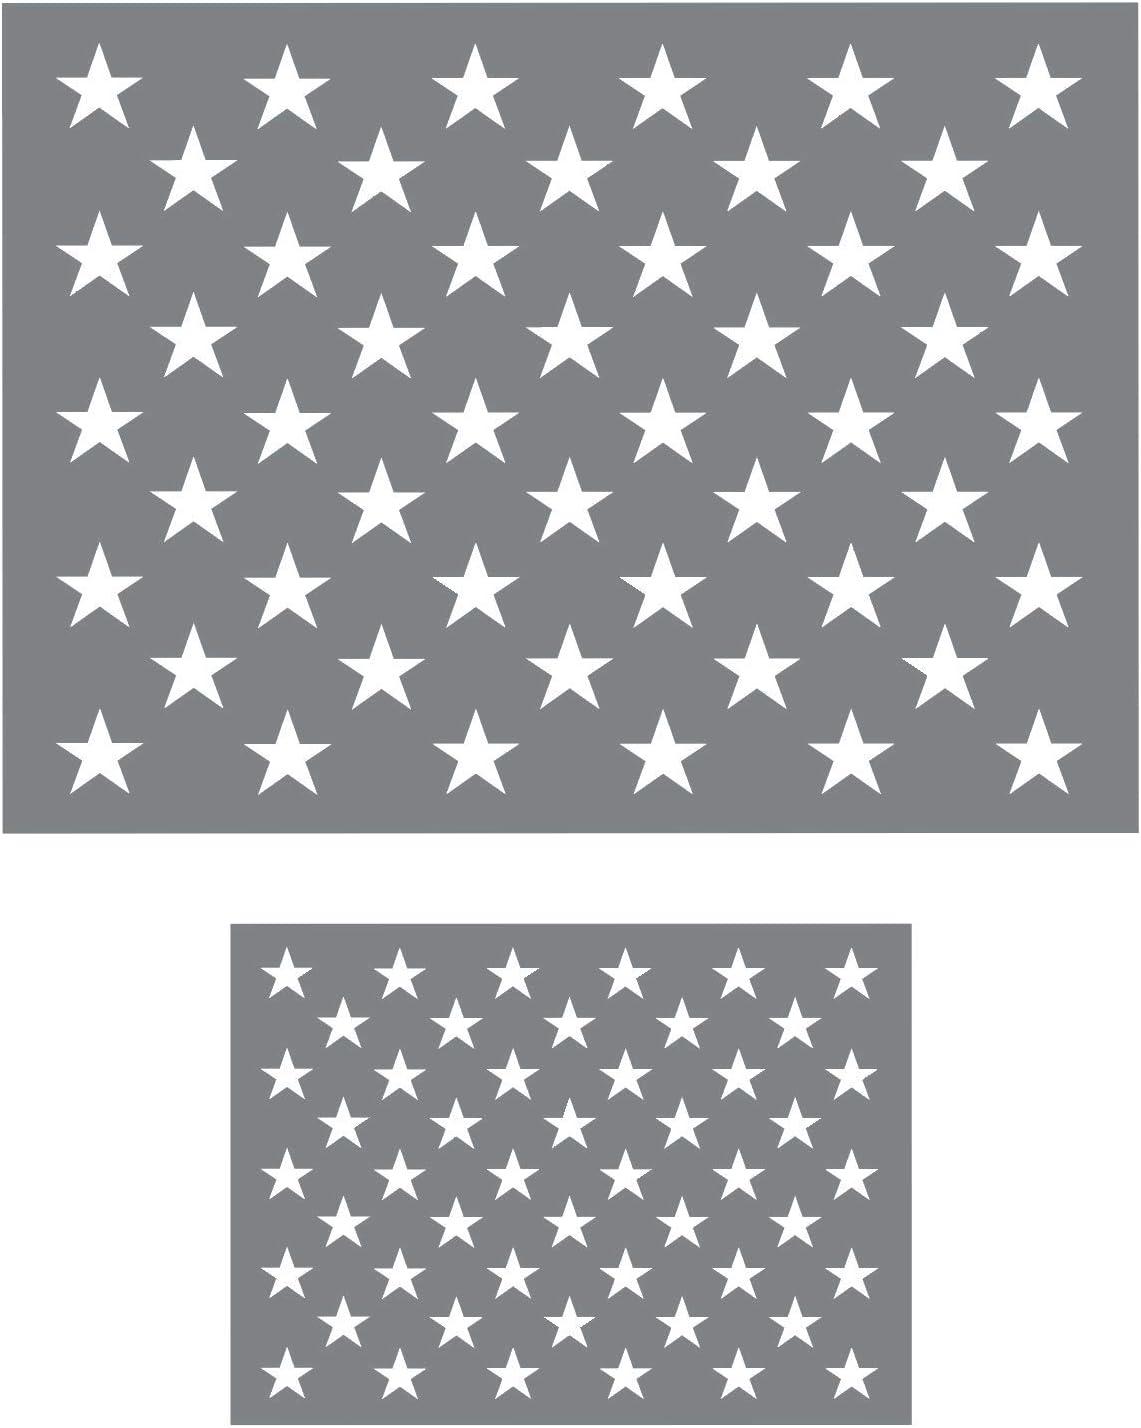 American Flag Star Stencil Template - American Flag Stencils for Painting on Wood - American Flag Star Stencils - Star Stencils - Flag Star Stencils - 50 Stars Stencil